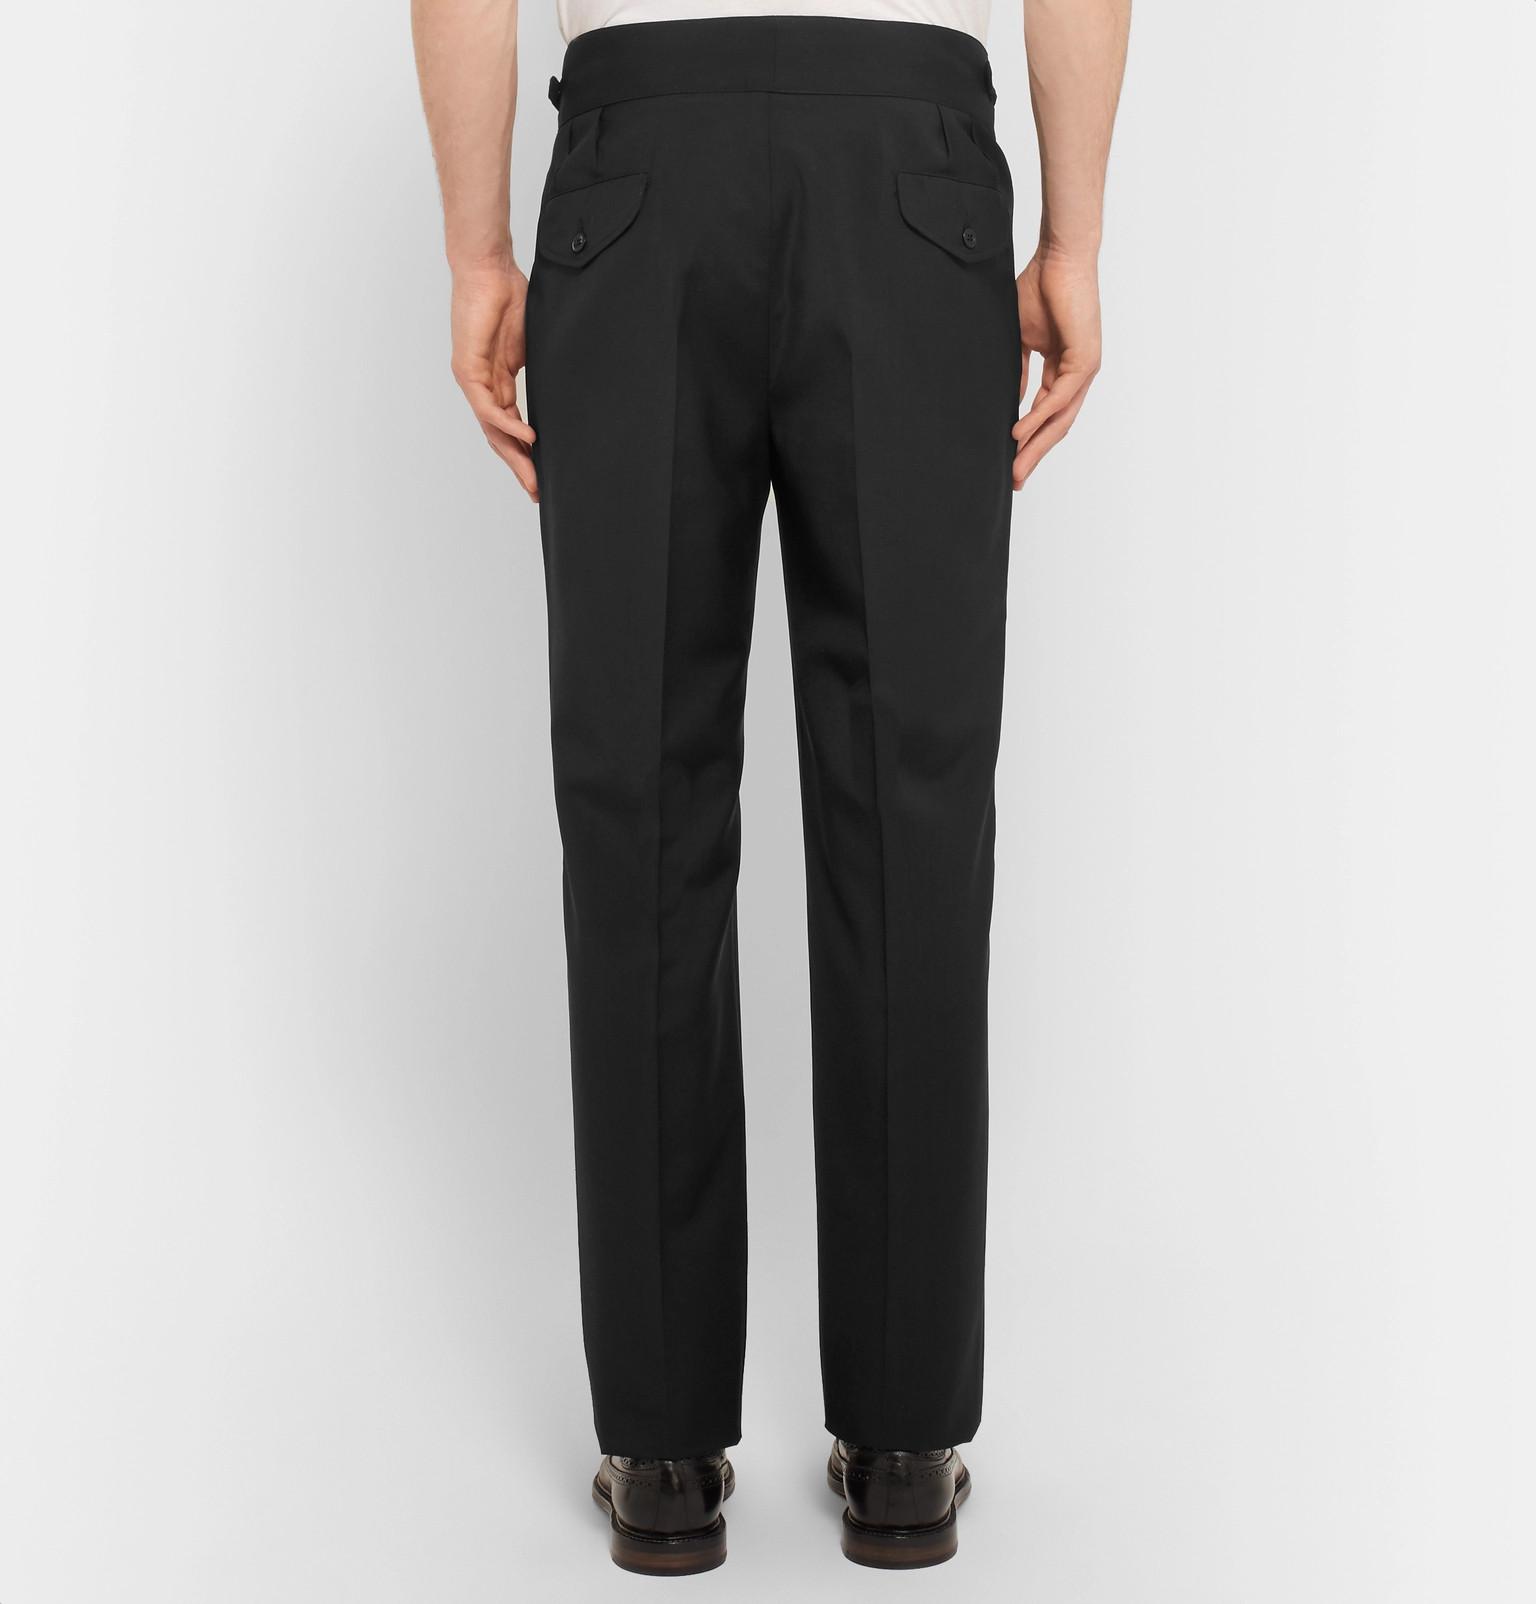 plisada pantalones mezcla de y virgen lana mohair de Rubinaccimanny vIxFwgqv